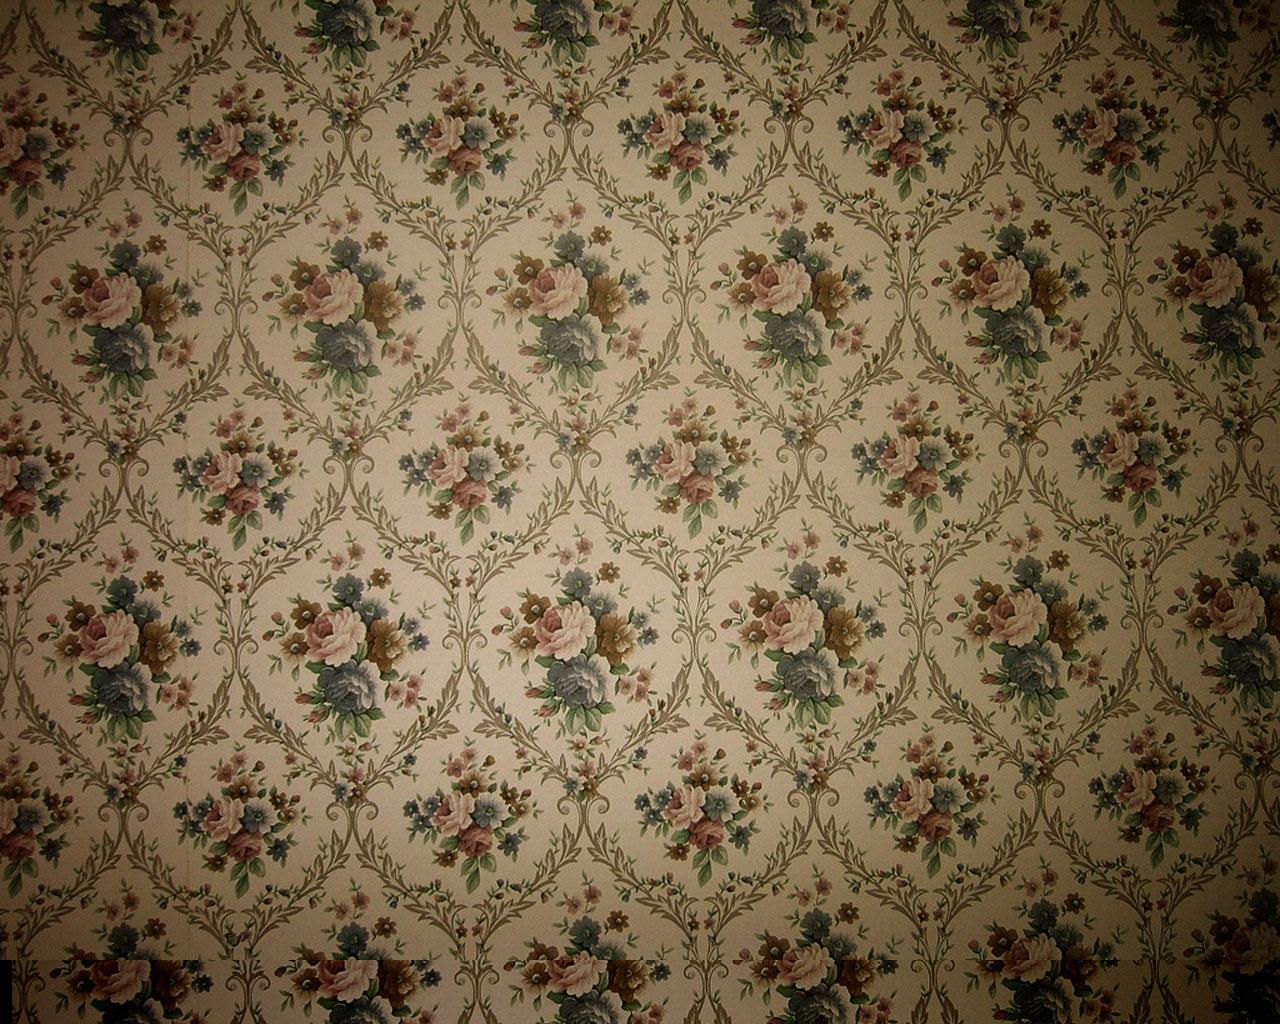 wallpaper Patterns OldtimeWallpaperscom   Antique wallpapers 1280x1024